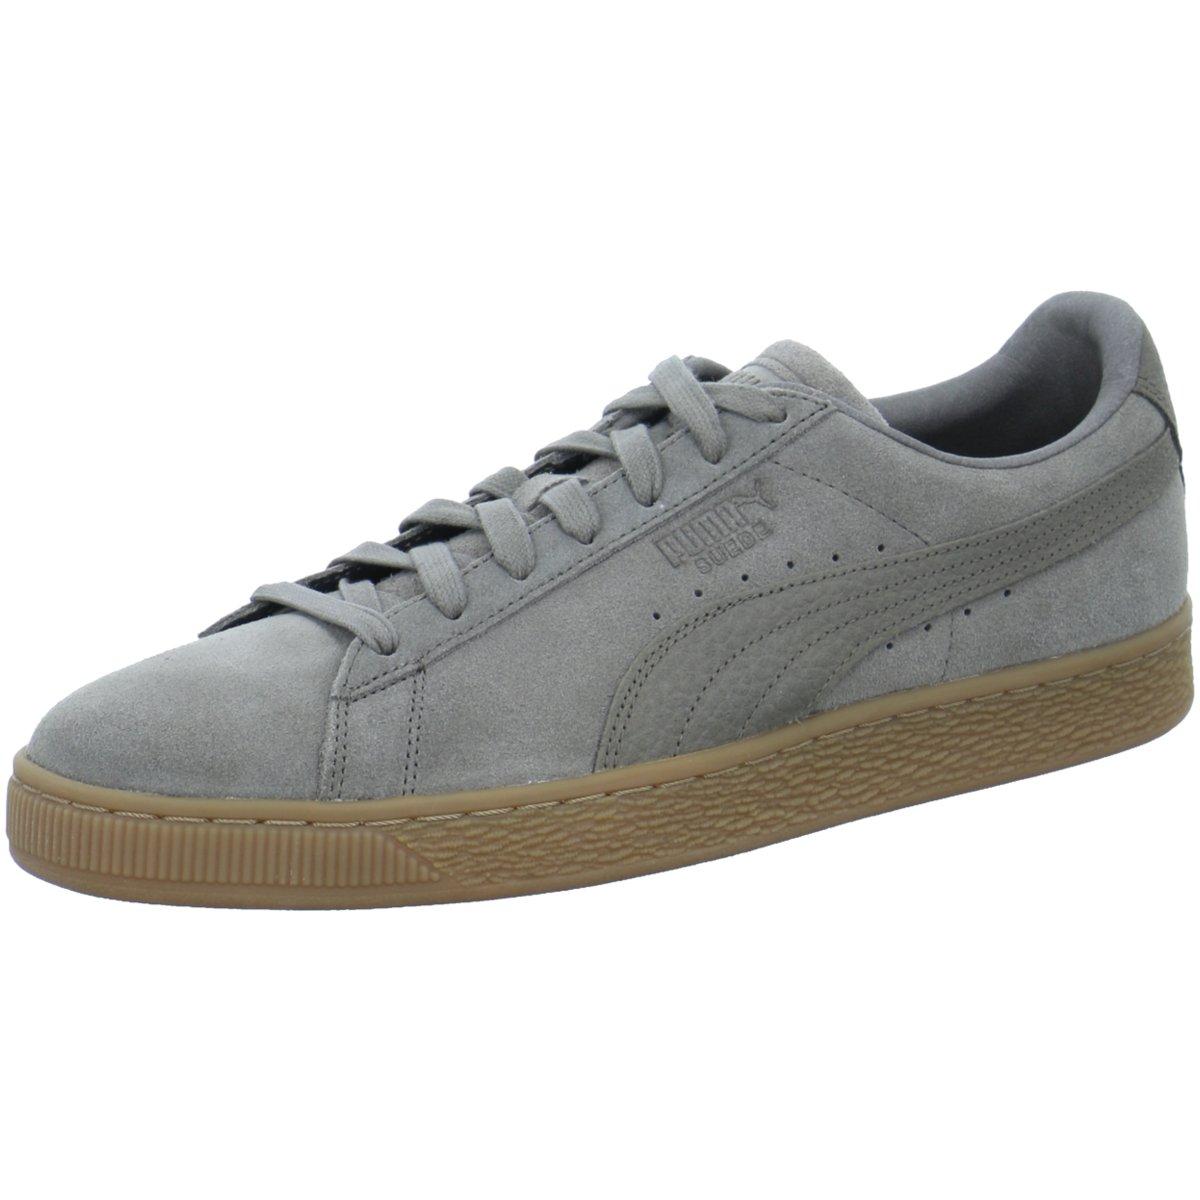 NEU Puma Herren Sneaker CL nat. warmth 363869/001 grau 358571